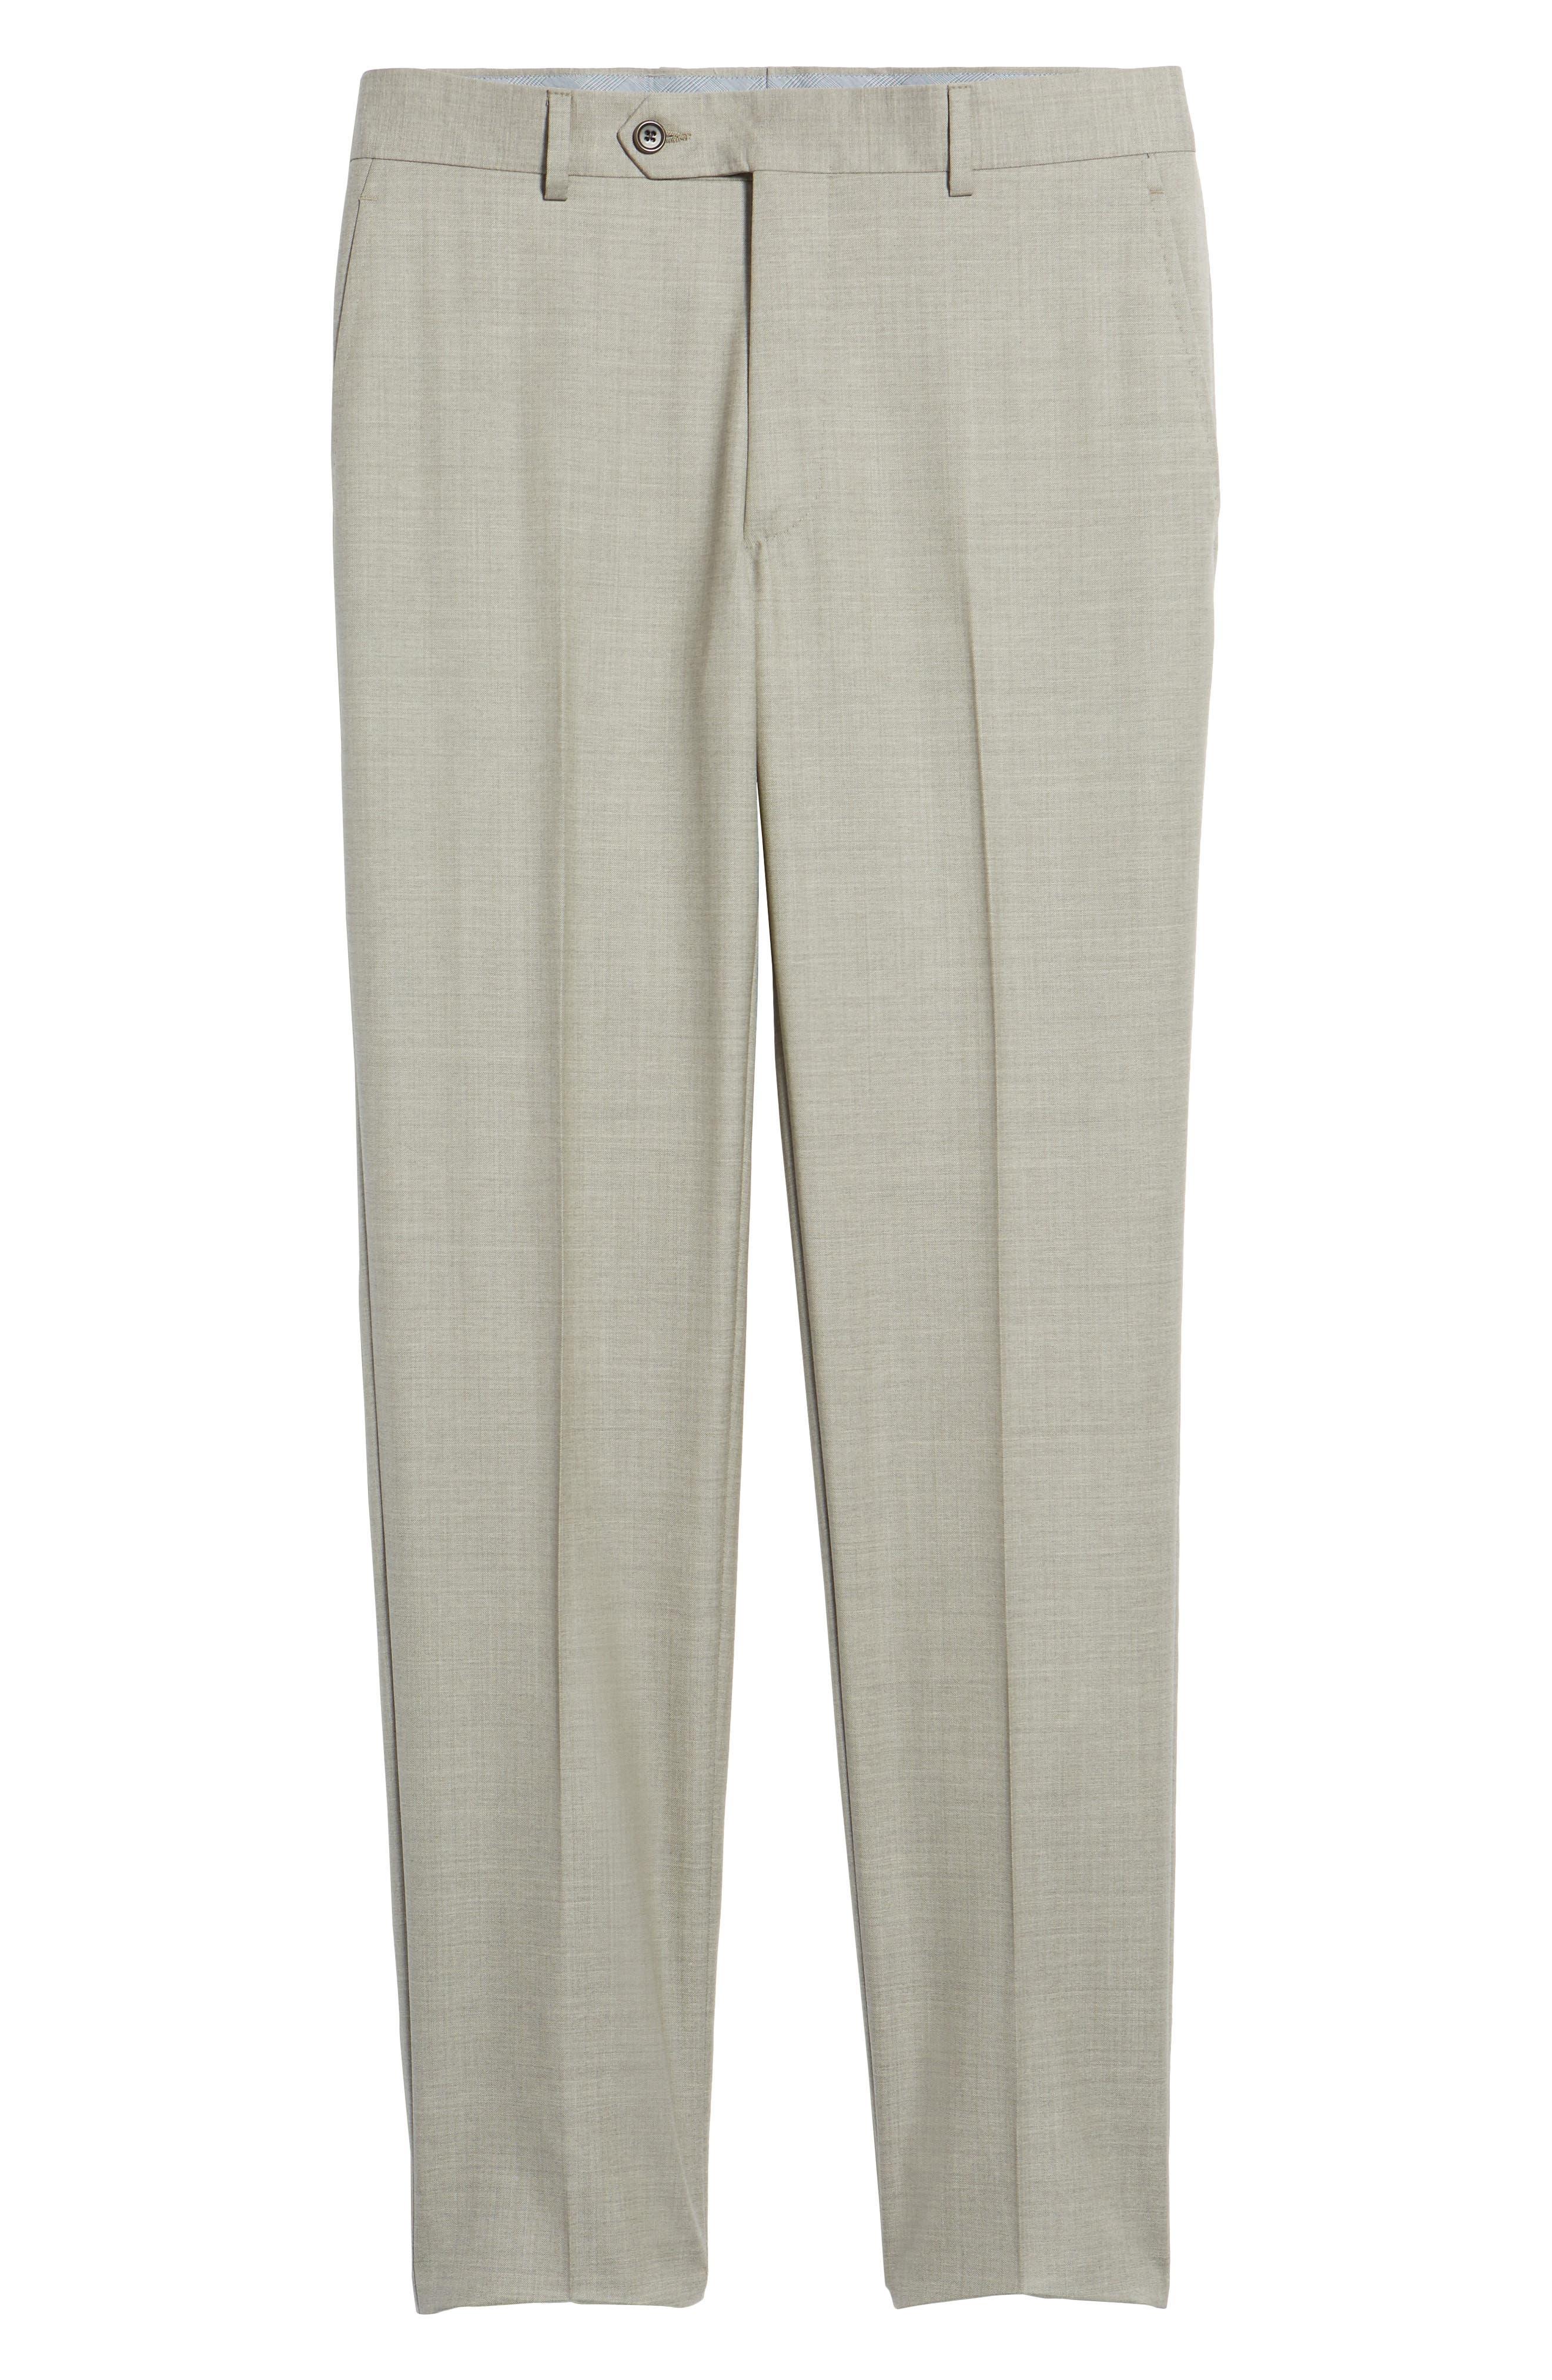 Peter Millar Multi Season Super 150s Wool Flat Front Trousers,                             Alternate thumbnail 6, color,                             Sabbia